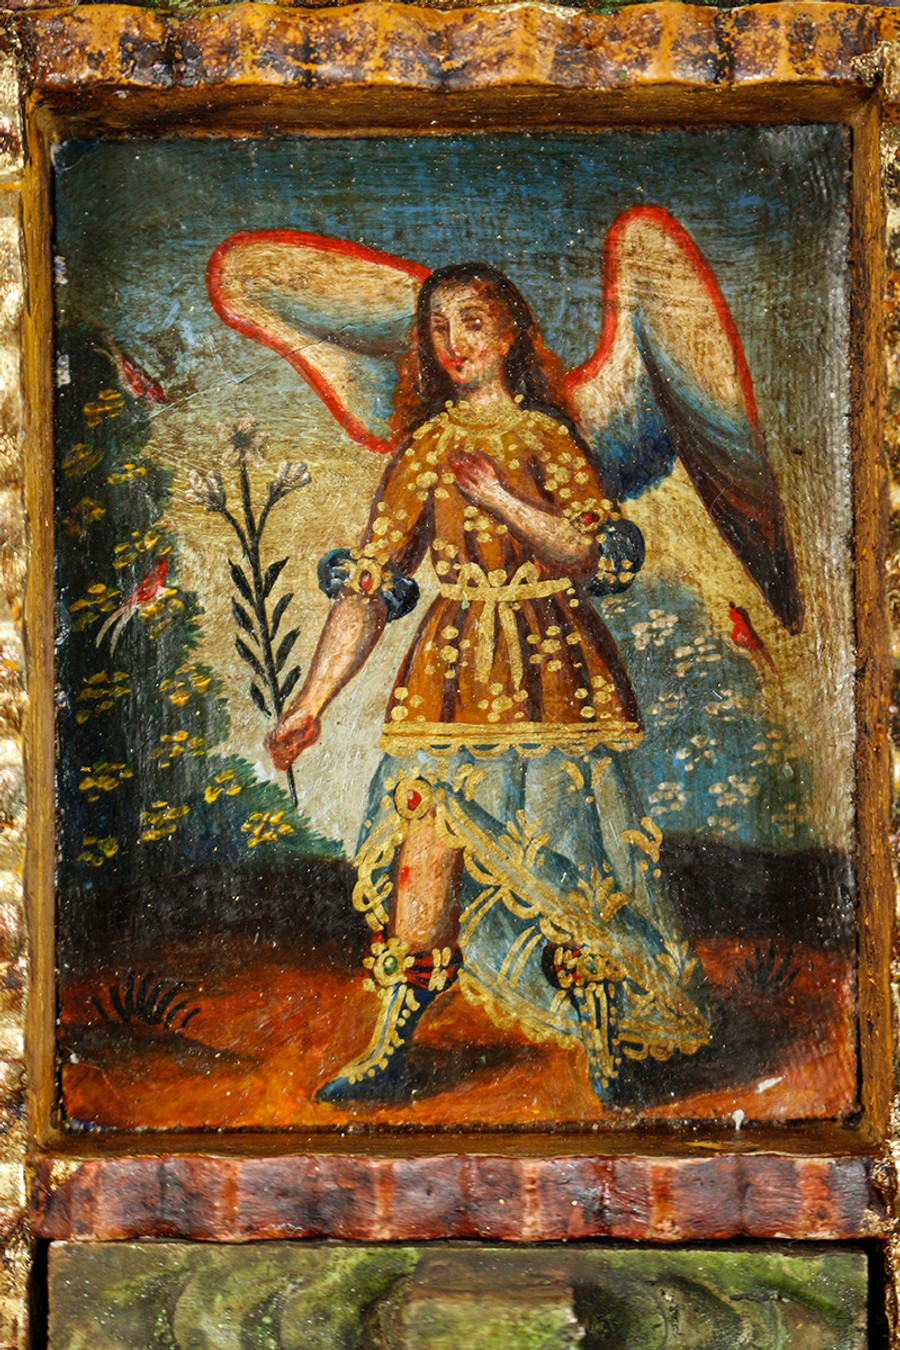 Archangel Gabriel Colonial Peru Art Handmade Retablo Handcarved Altarpiece (71-100-04437)